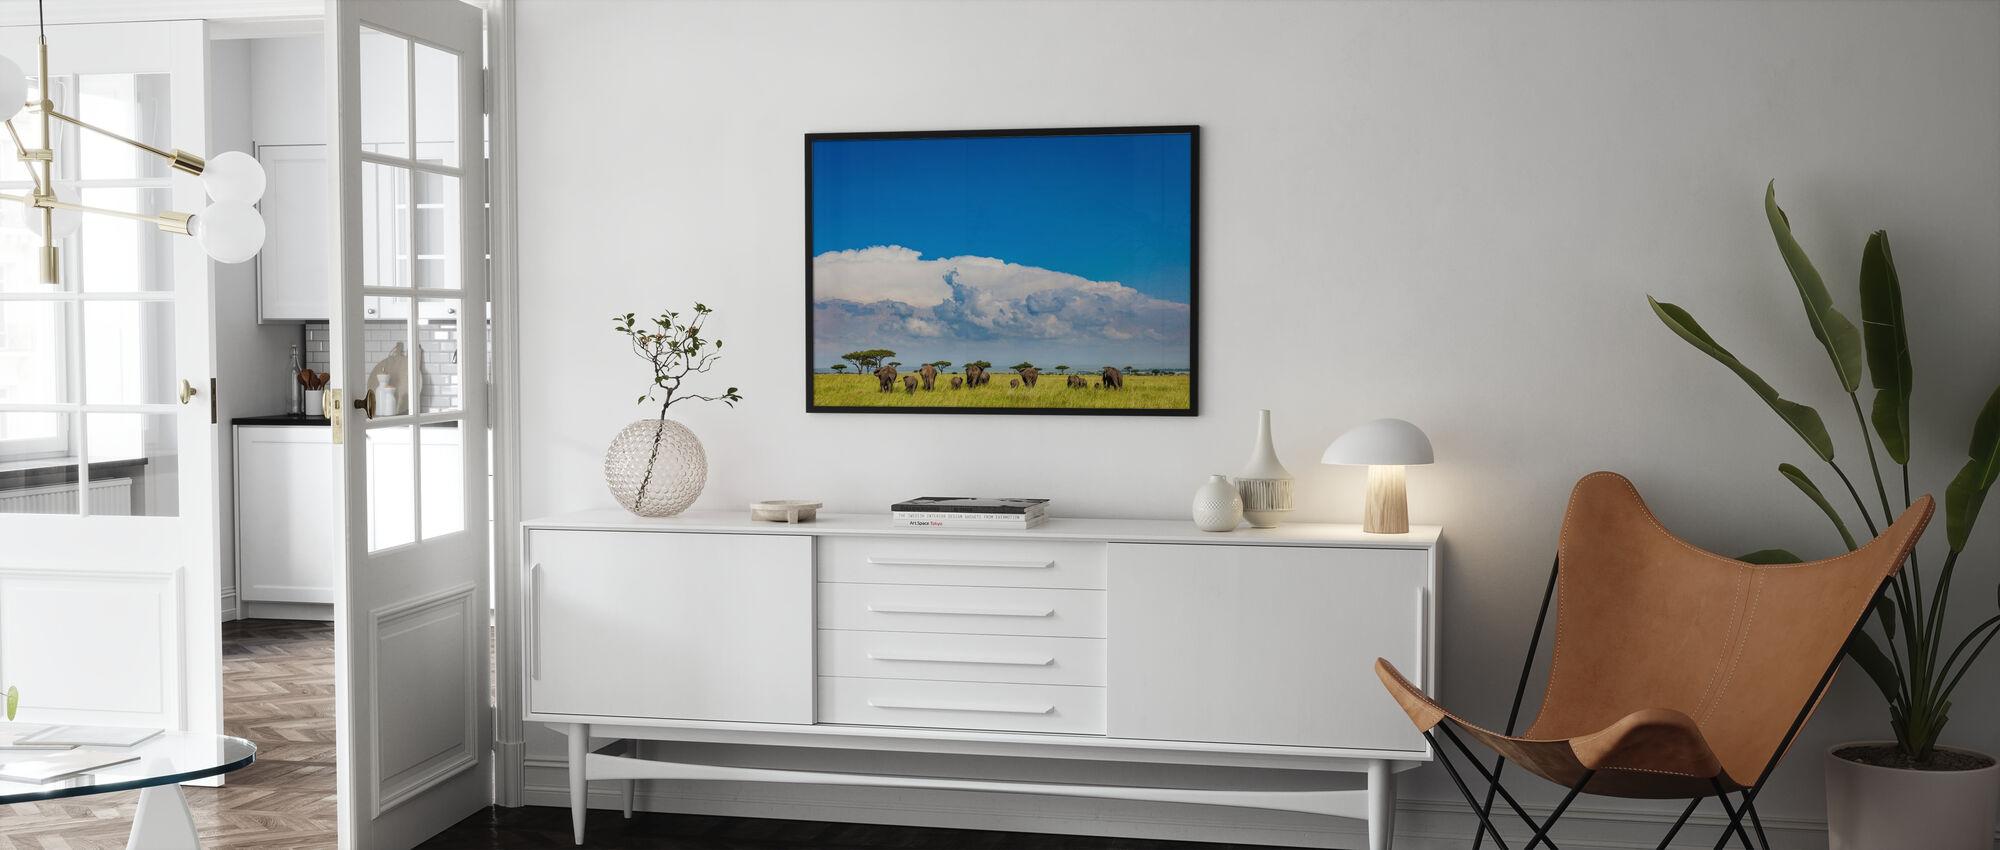 Wanderers - Poster - Living Room